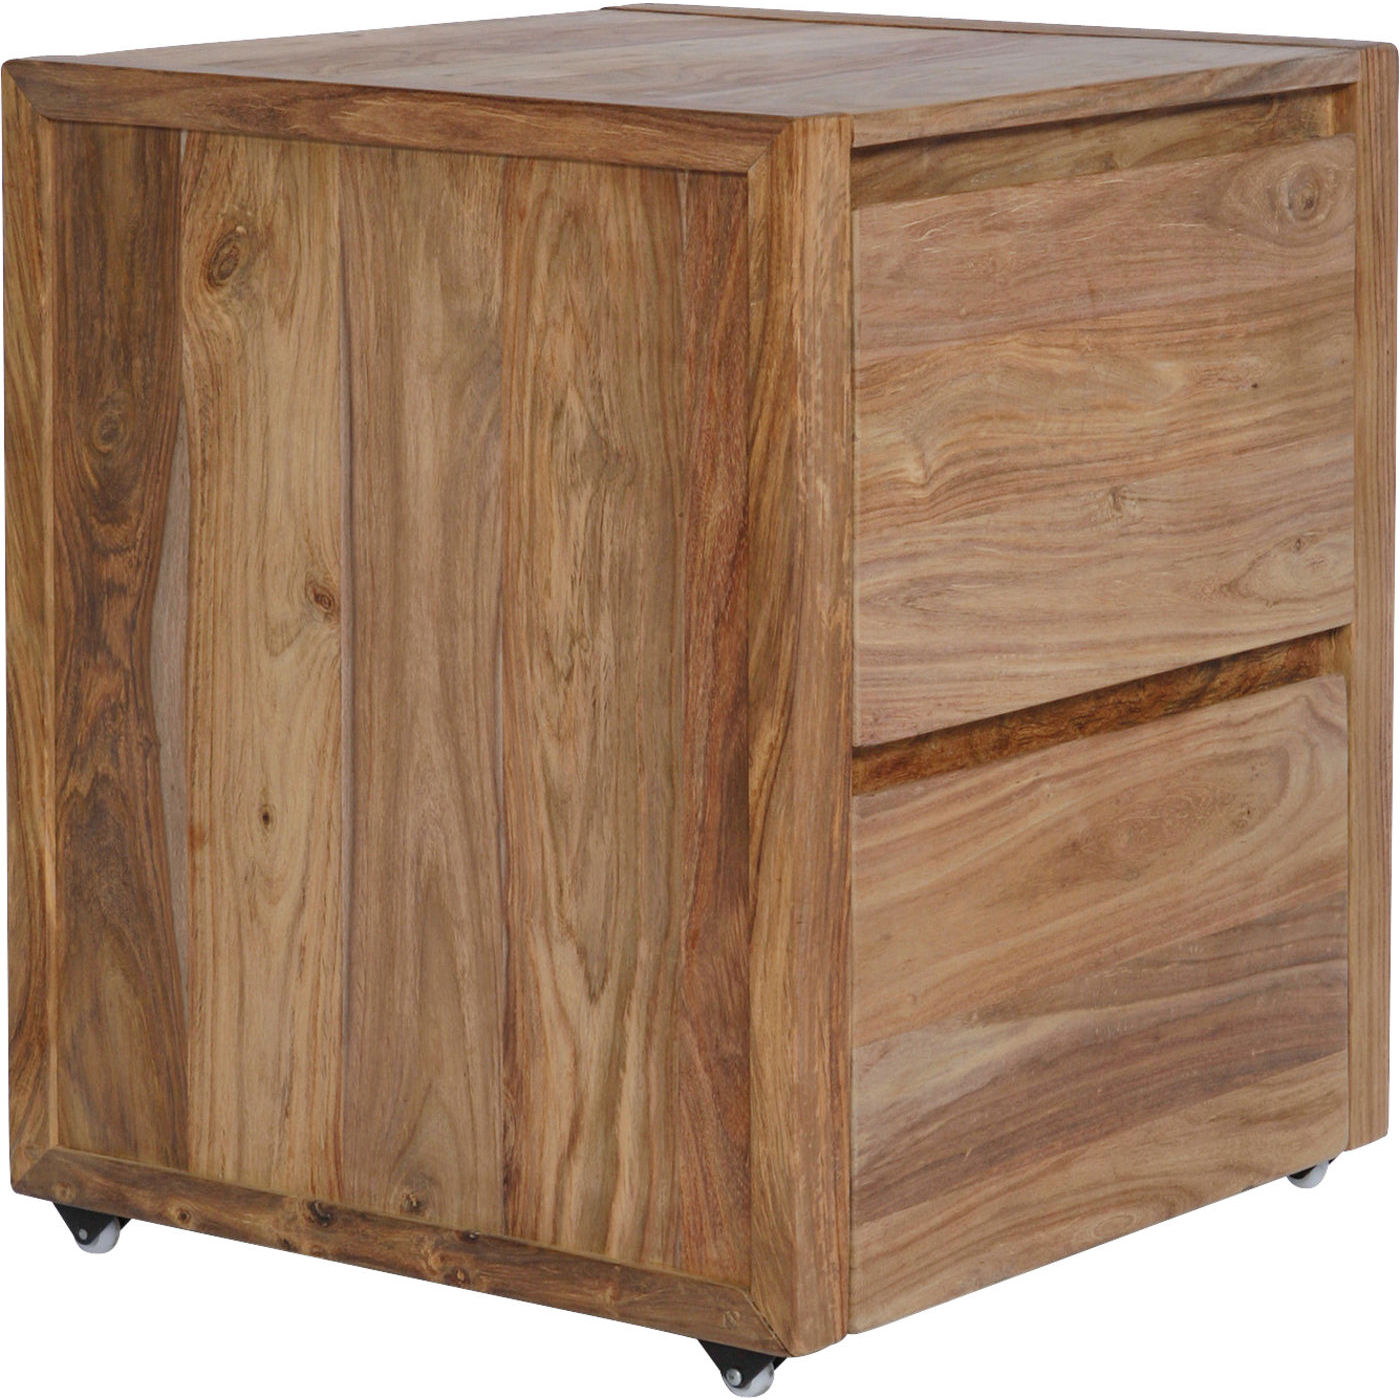 Design ladenblok kopen online internetwinkel for Ladeblok hout